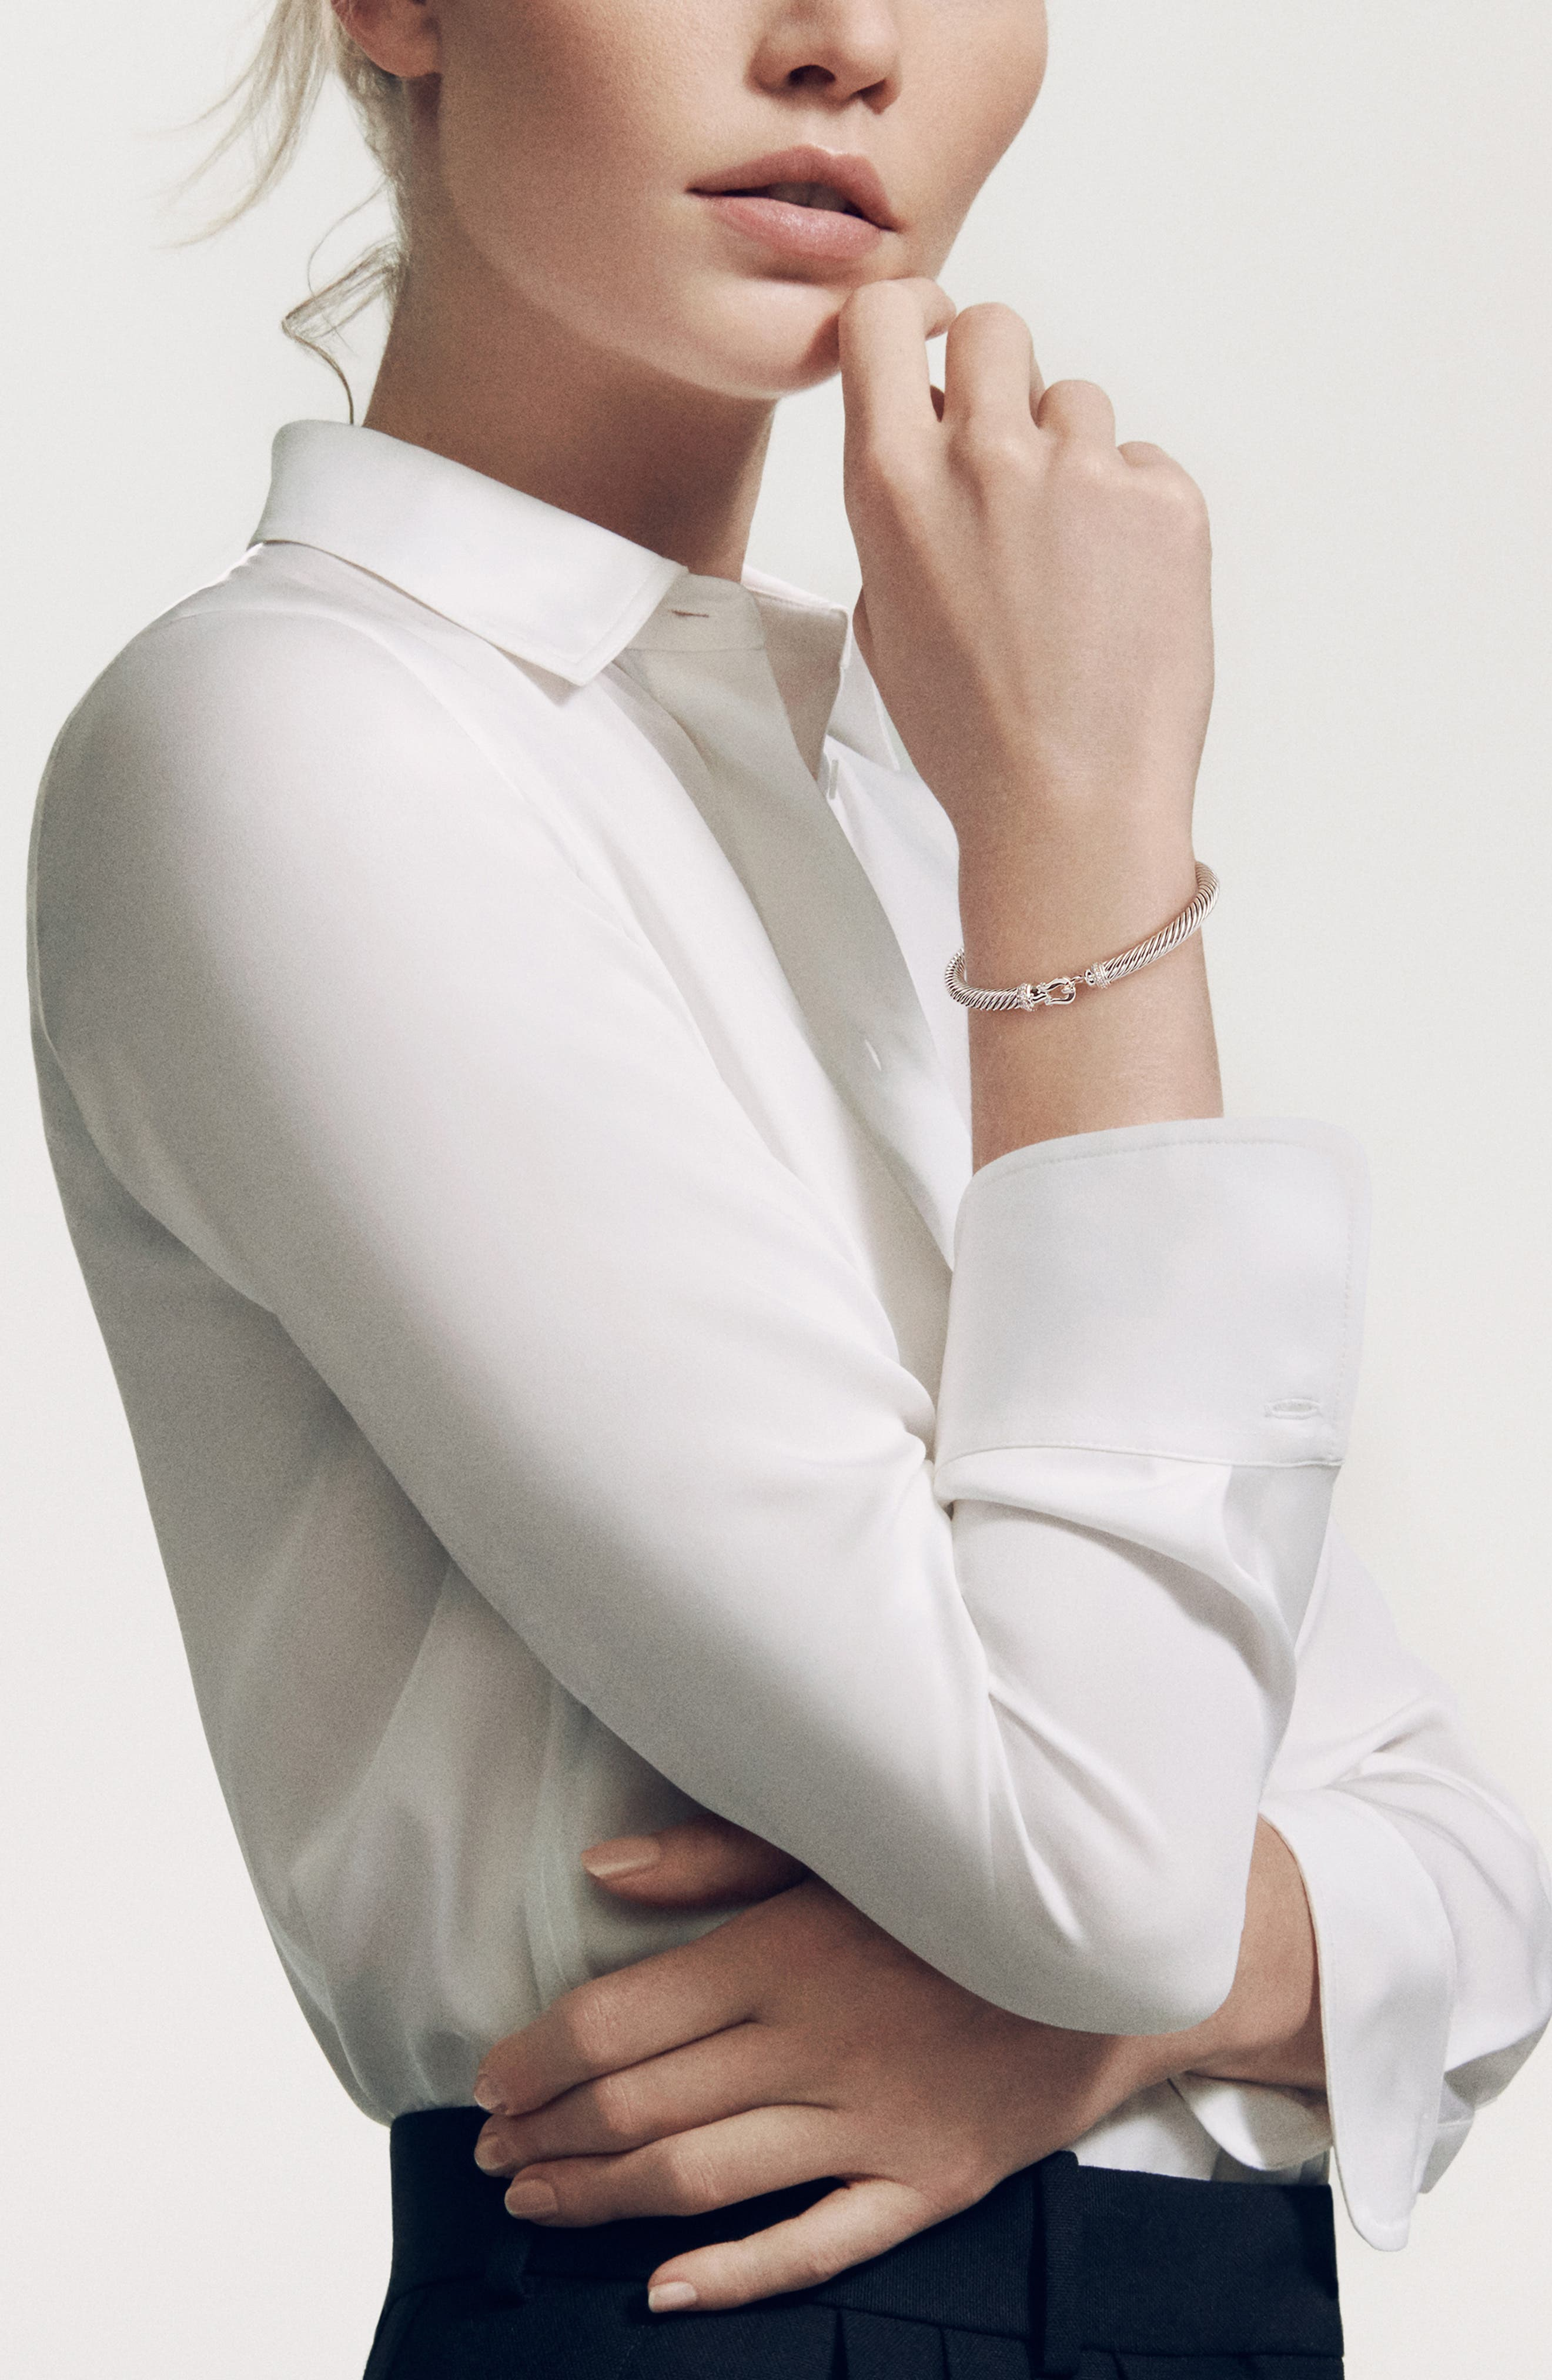 DAVID YURMAN, Cable Buckle Bracelet with Diamonds, 5mm, Alternate thumbnail 2, color, DIAMOND